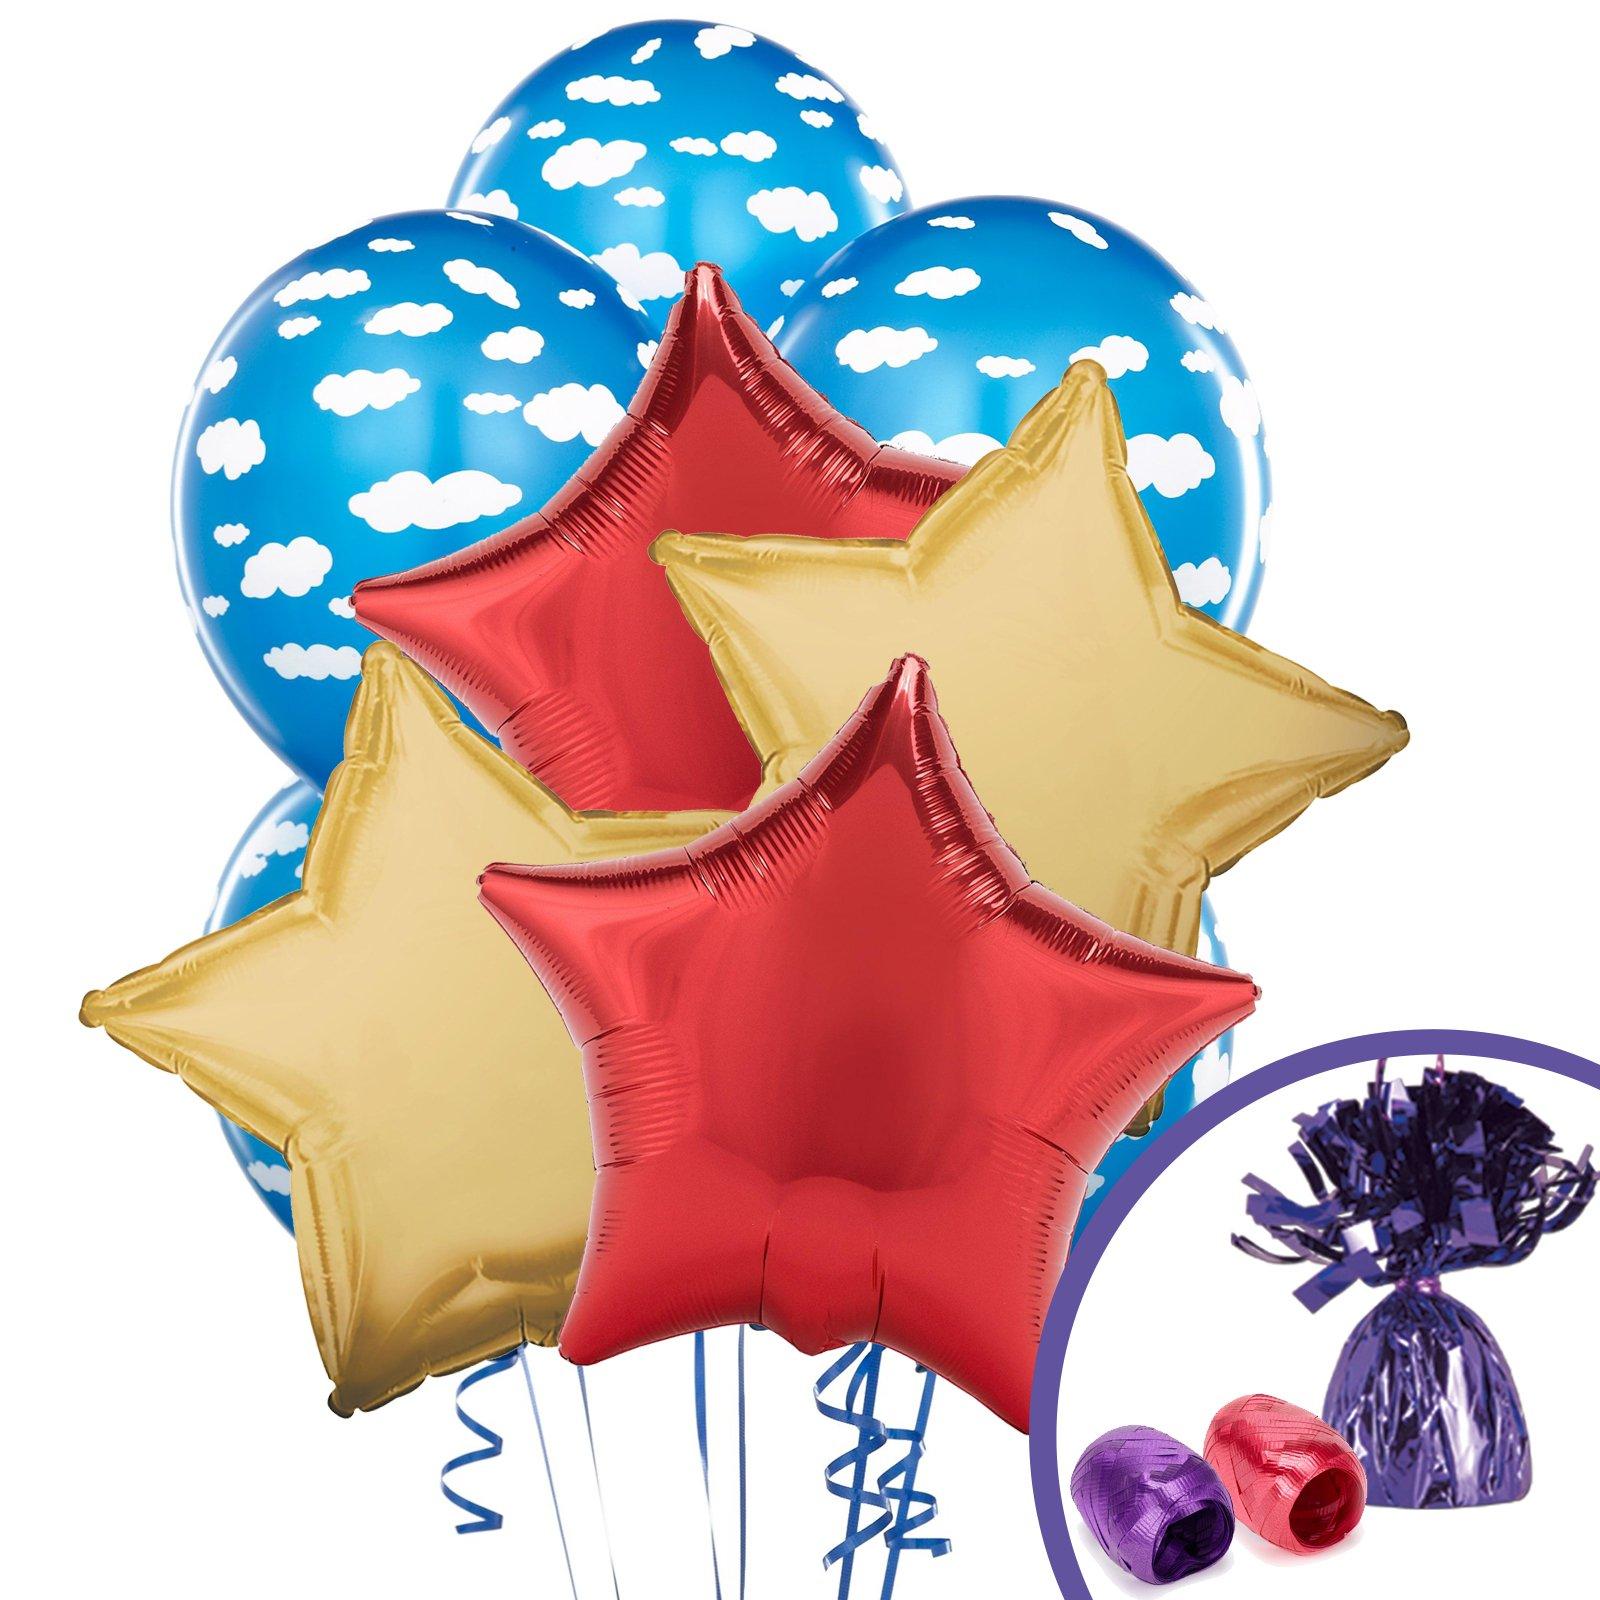 BirthdayExpress Medieval Prince Balloon Bouquet